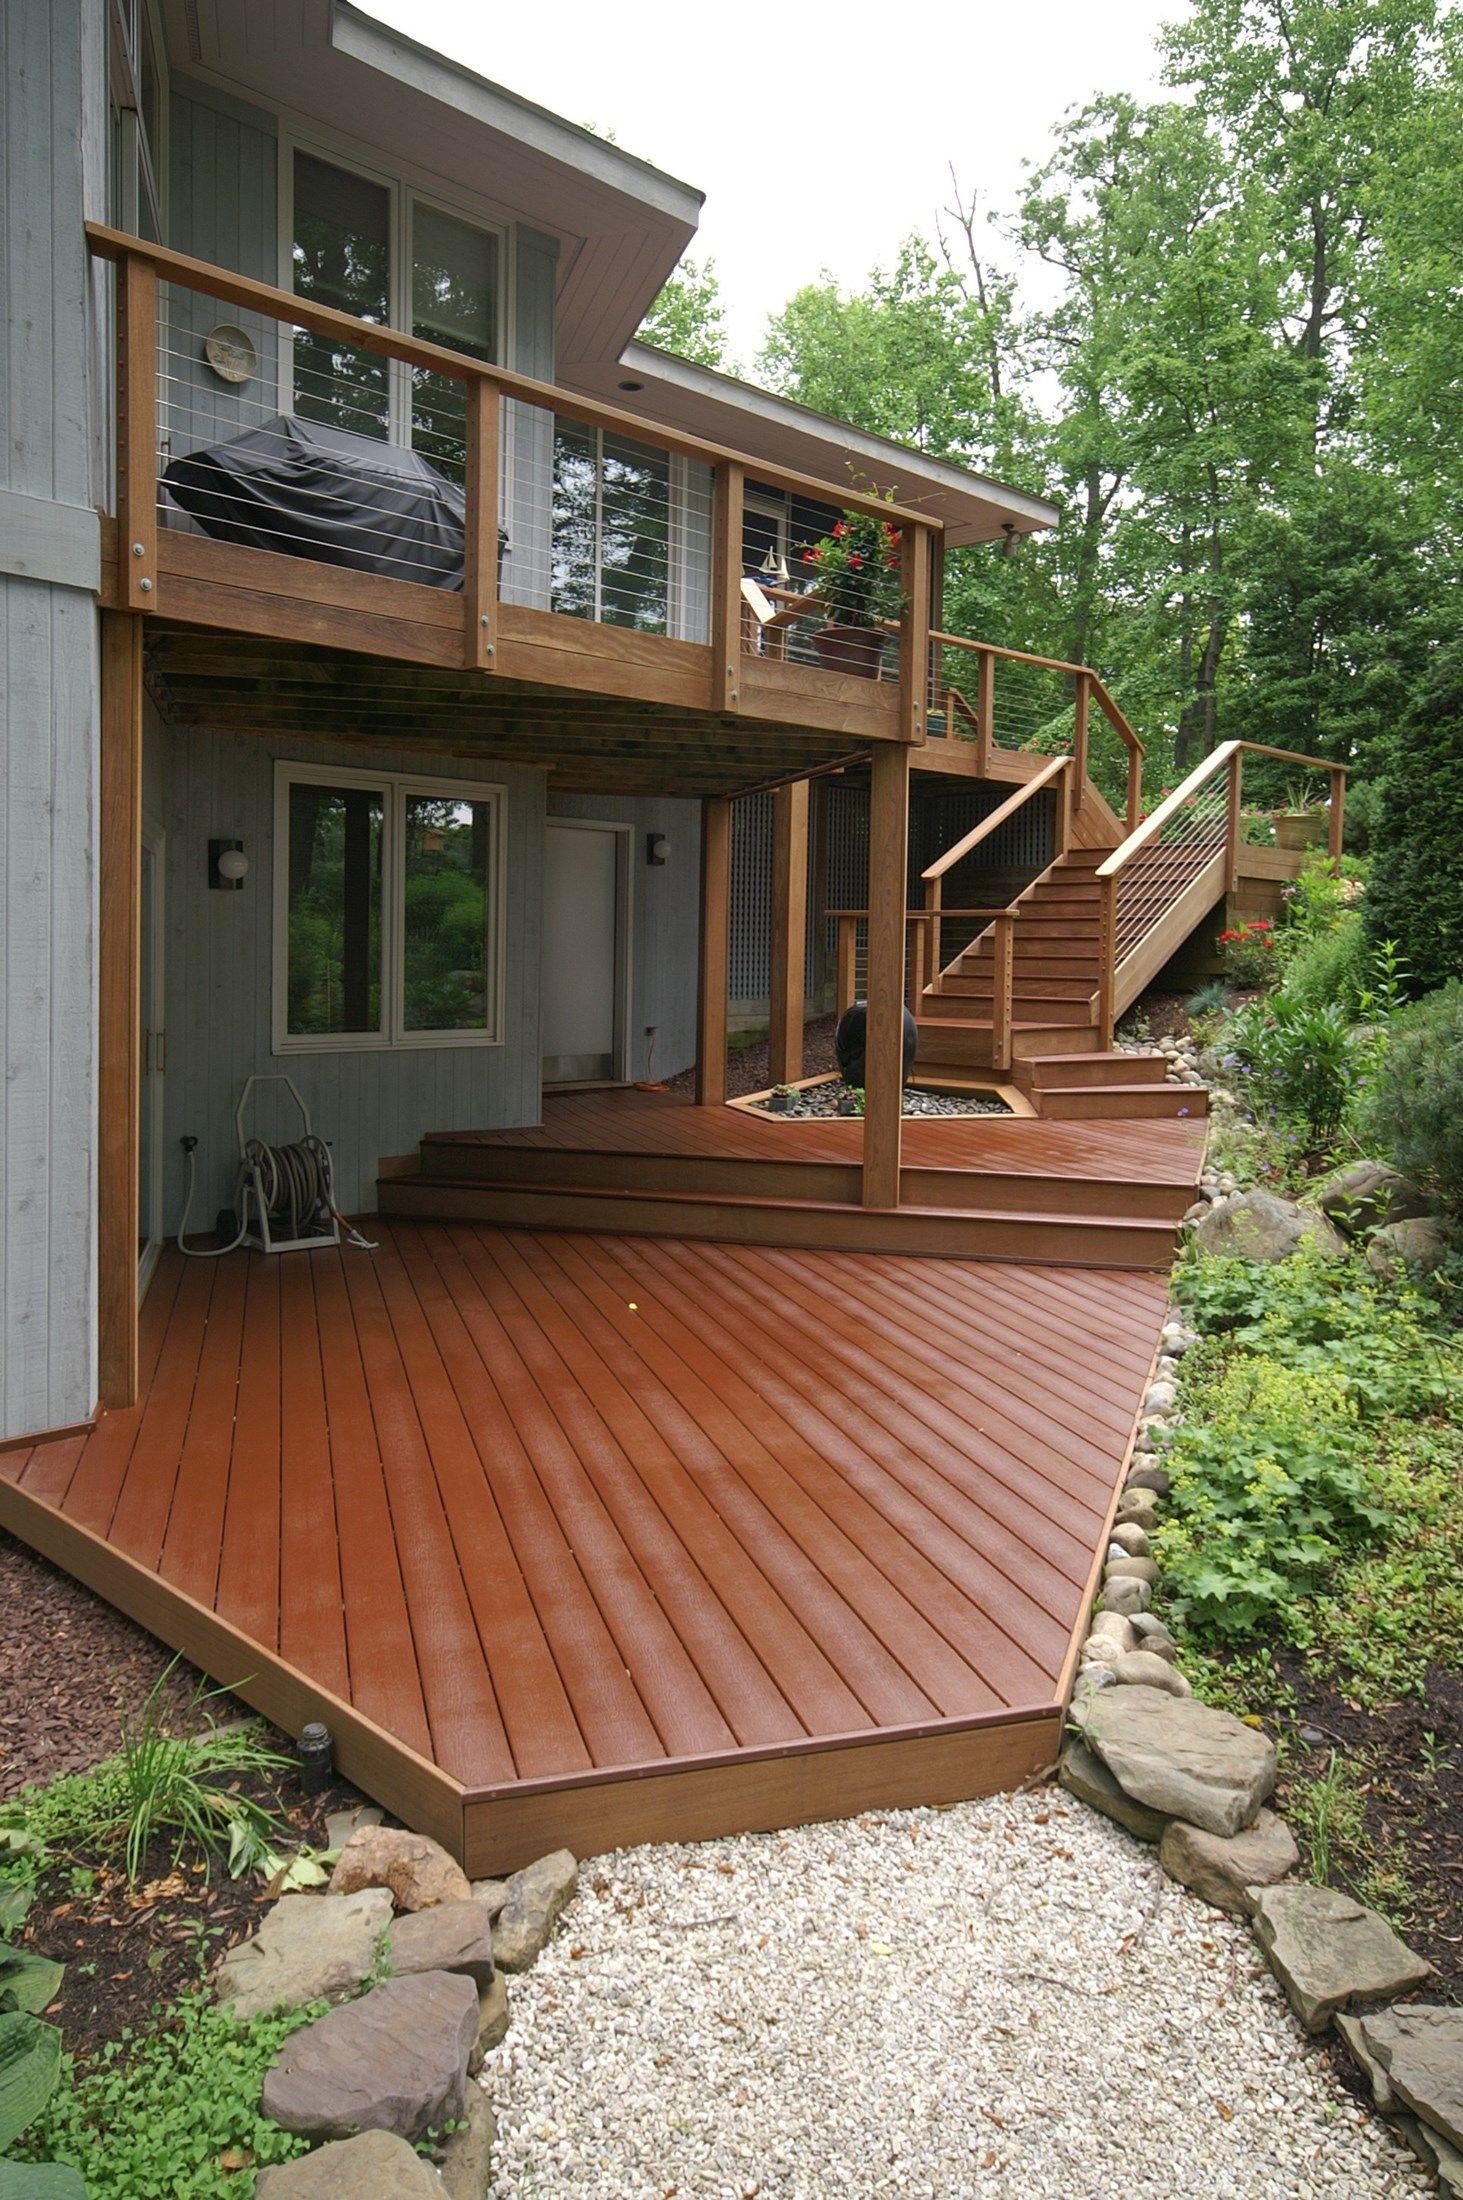 beautiful deck ideas on decks com decks backyard patio deck designs deck designs multi level decks backyard patio deck designs